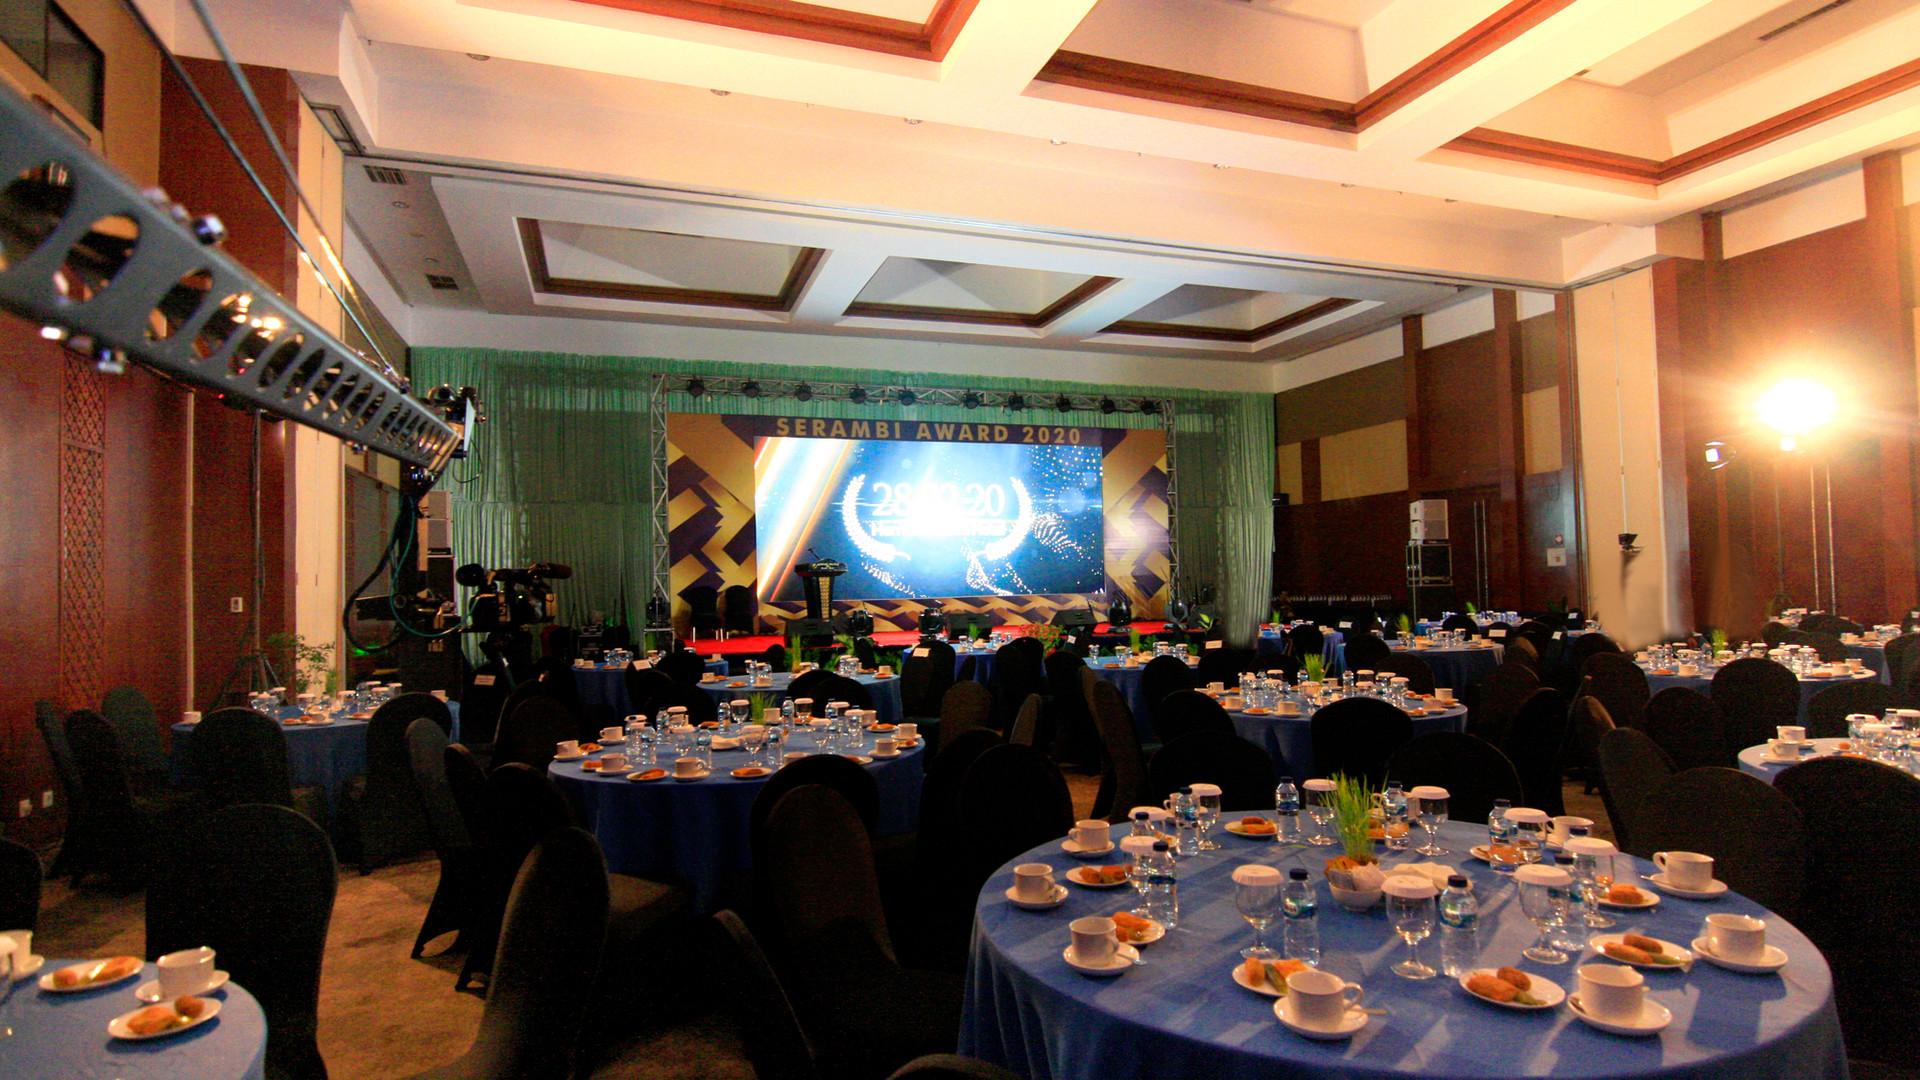 aceh-ballroom4.jpg